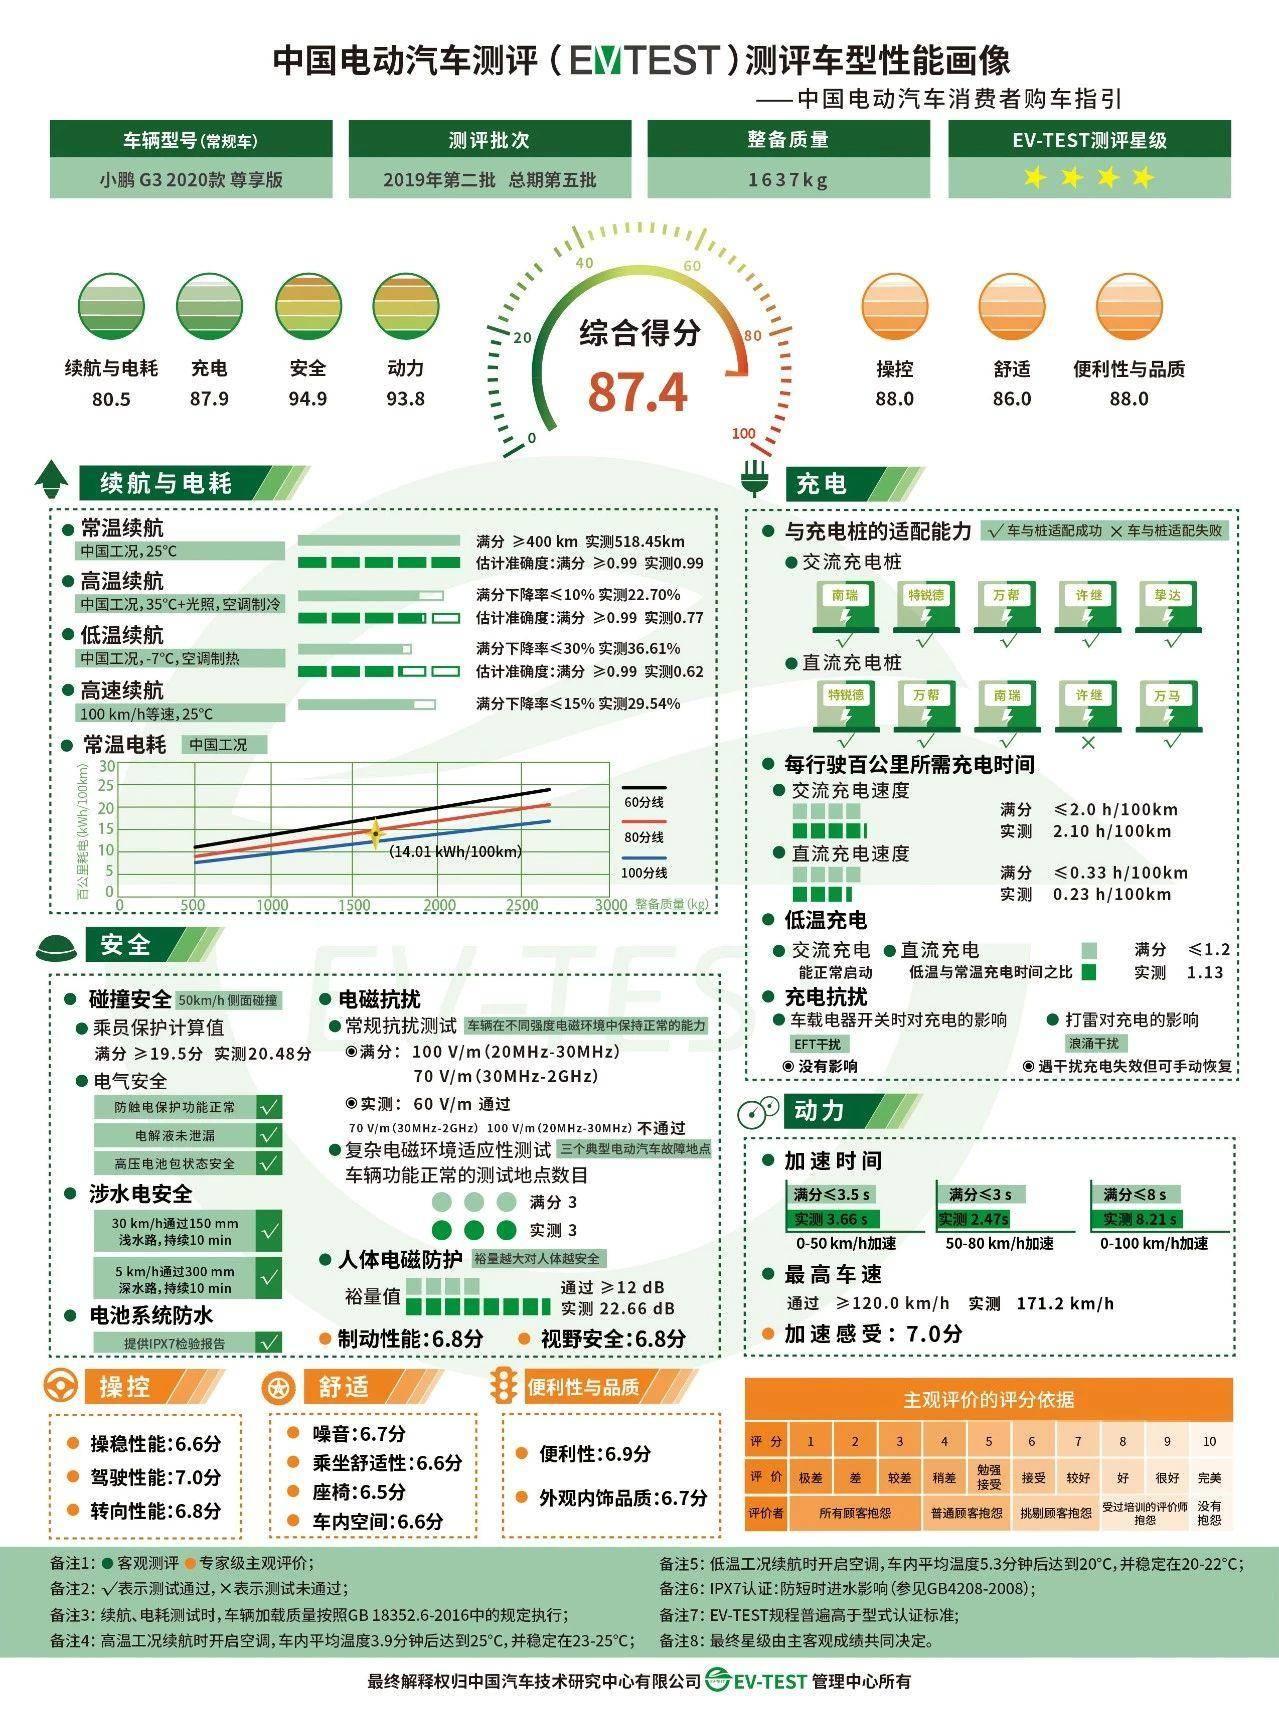 http://cools.qctt.cn/1577948783779.jpeg?imageMogr2/size-limit/1024k!